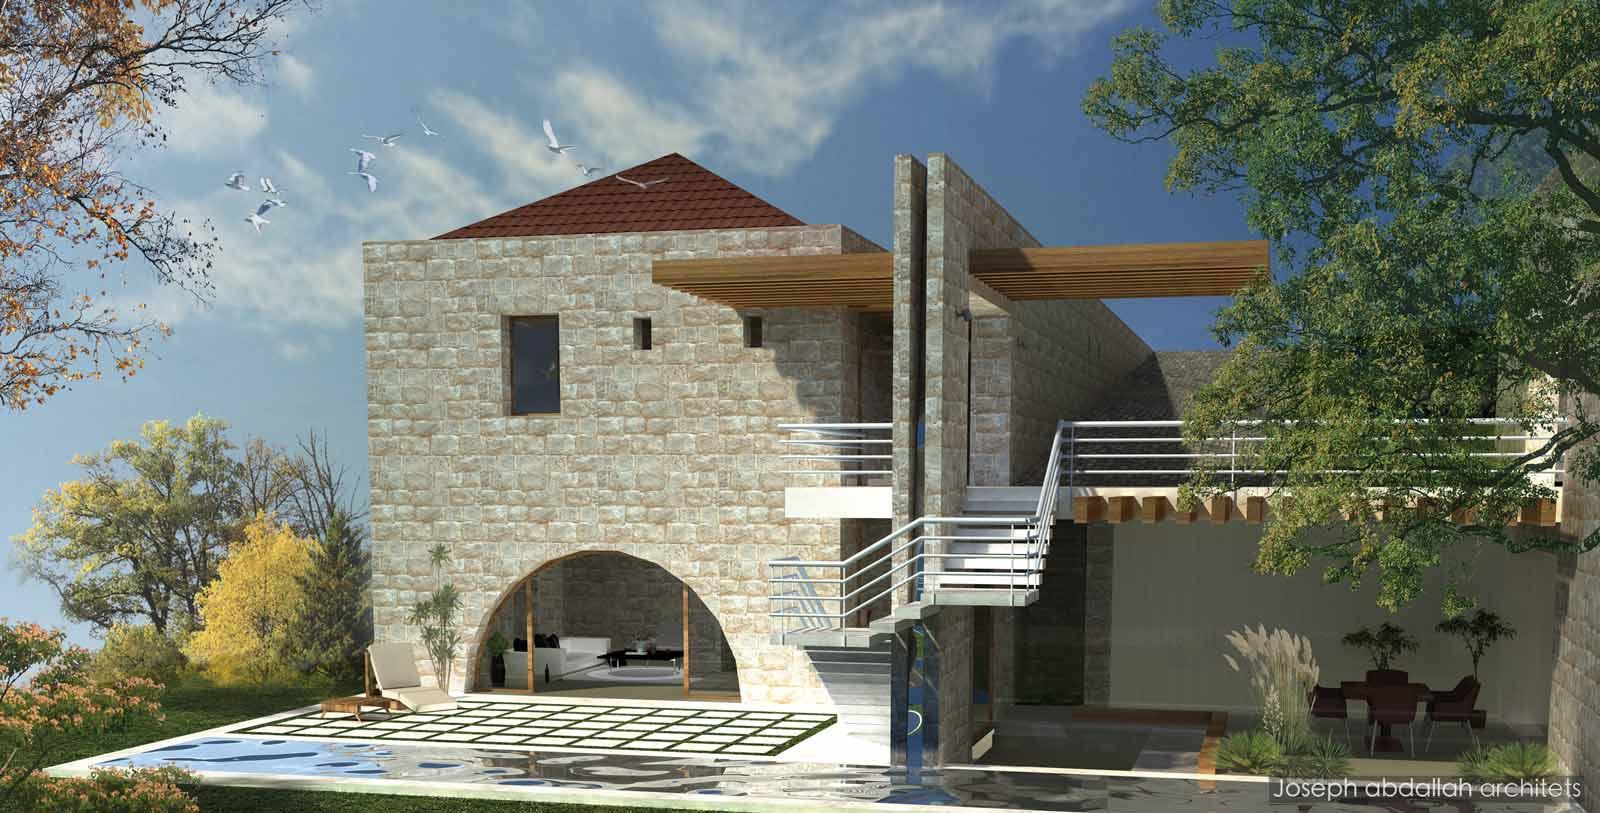 Domaine du chene joseph abdallah architects for Domaine architecture